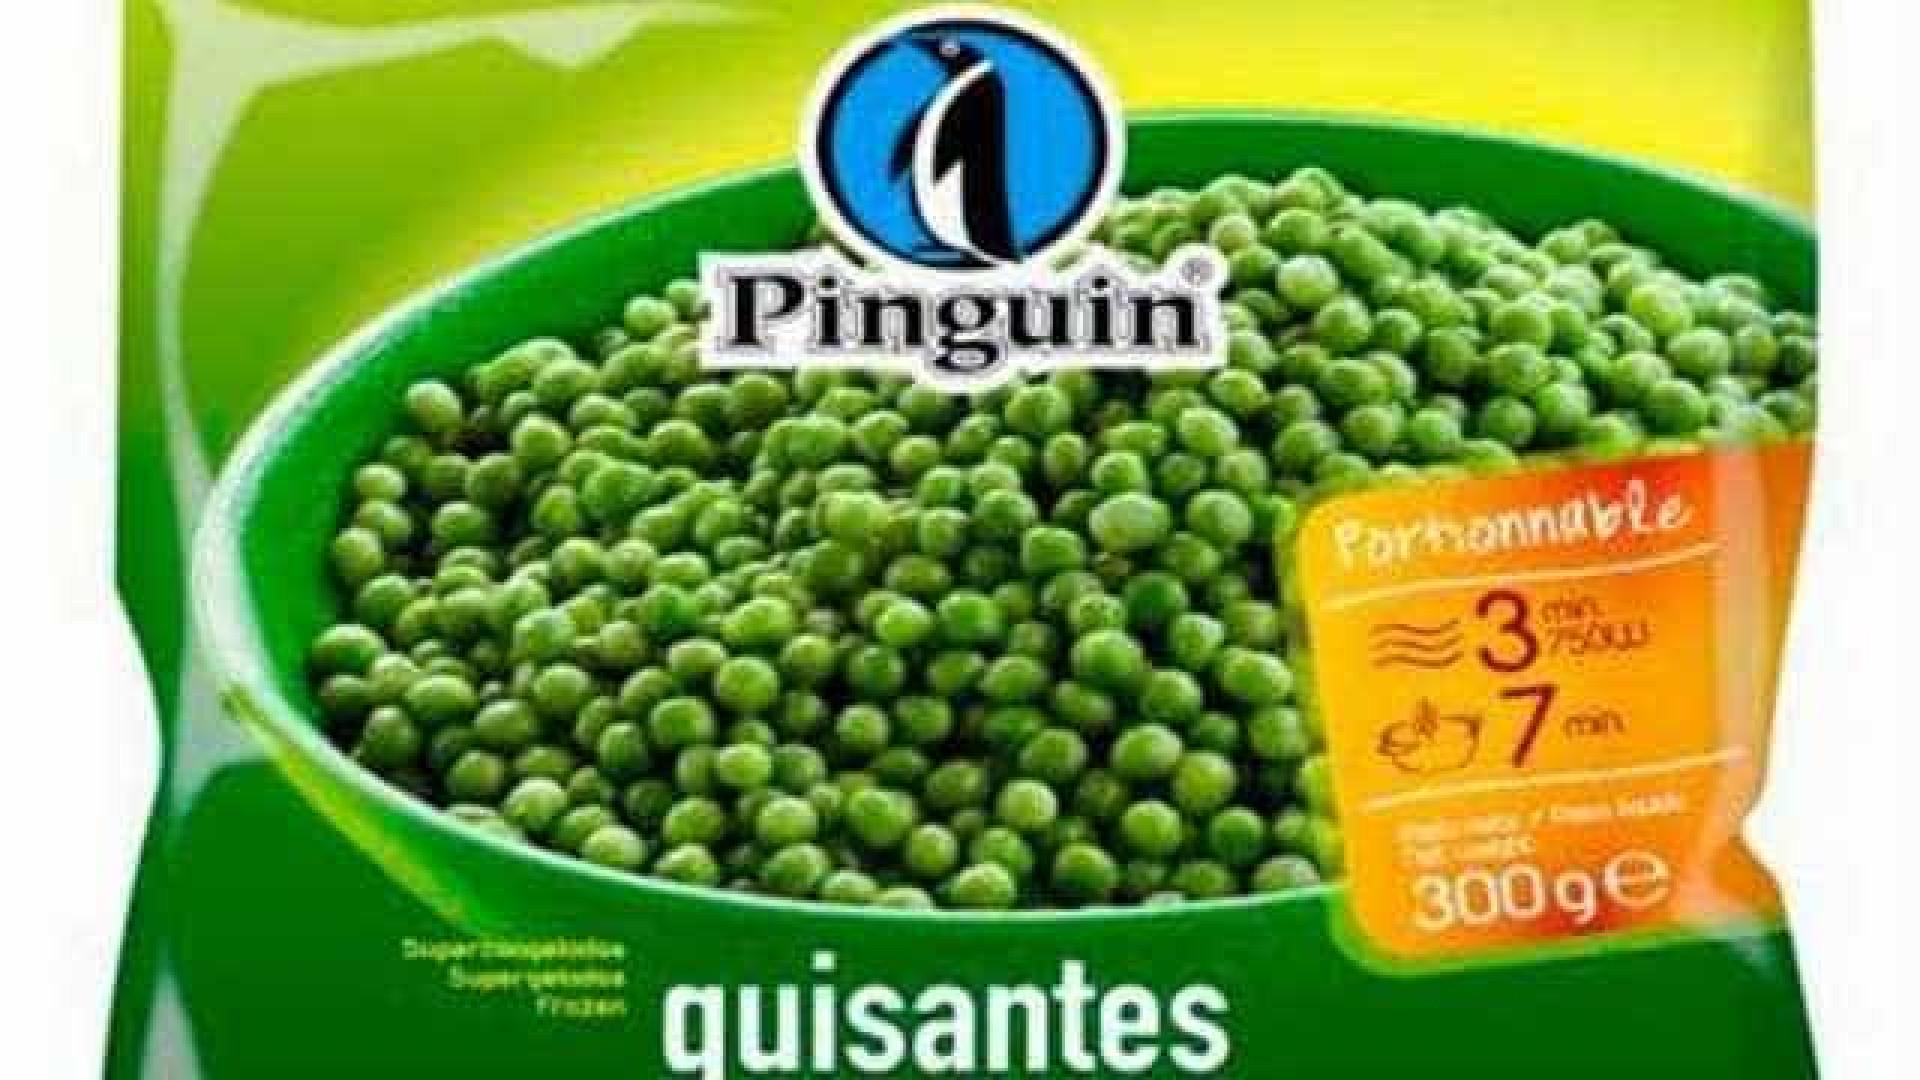 Anvisa suspende venda de vegetais congelados